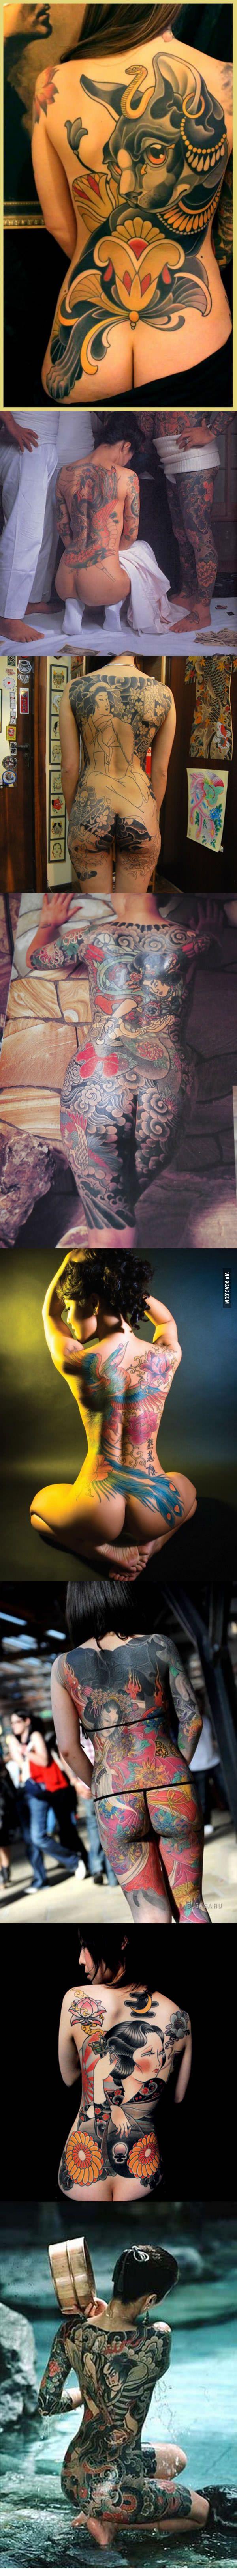 Beautiful Japanese women with Irezumi (Traditional Japanese tattooing)